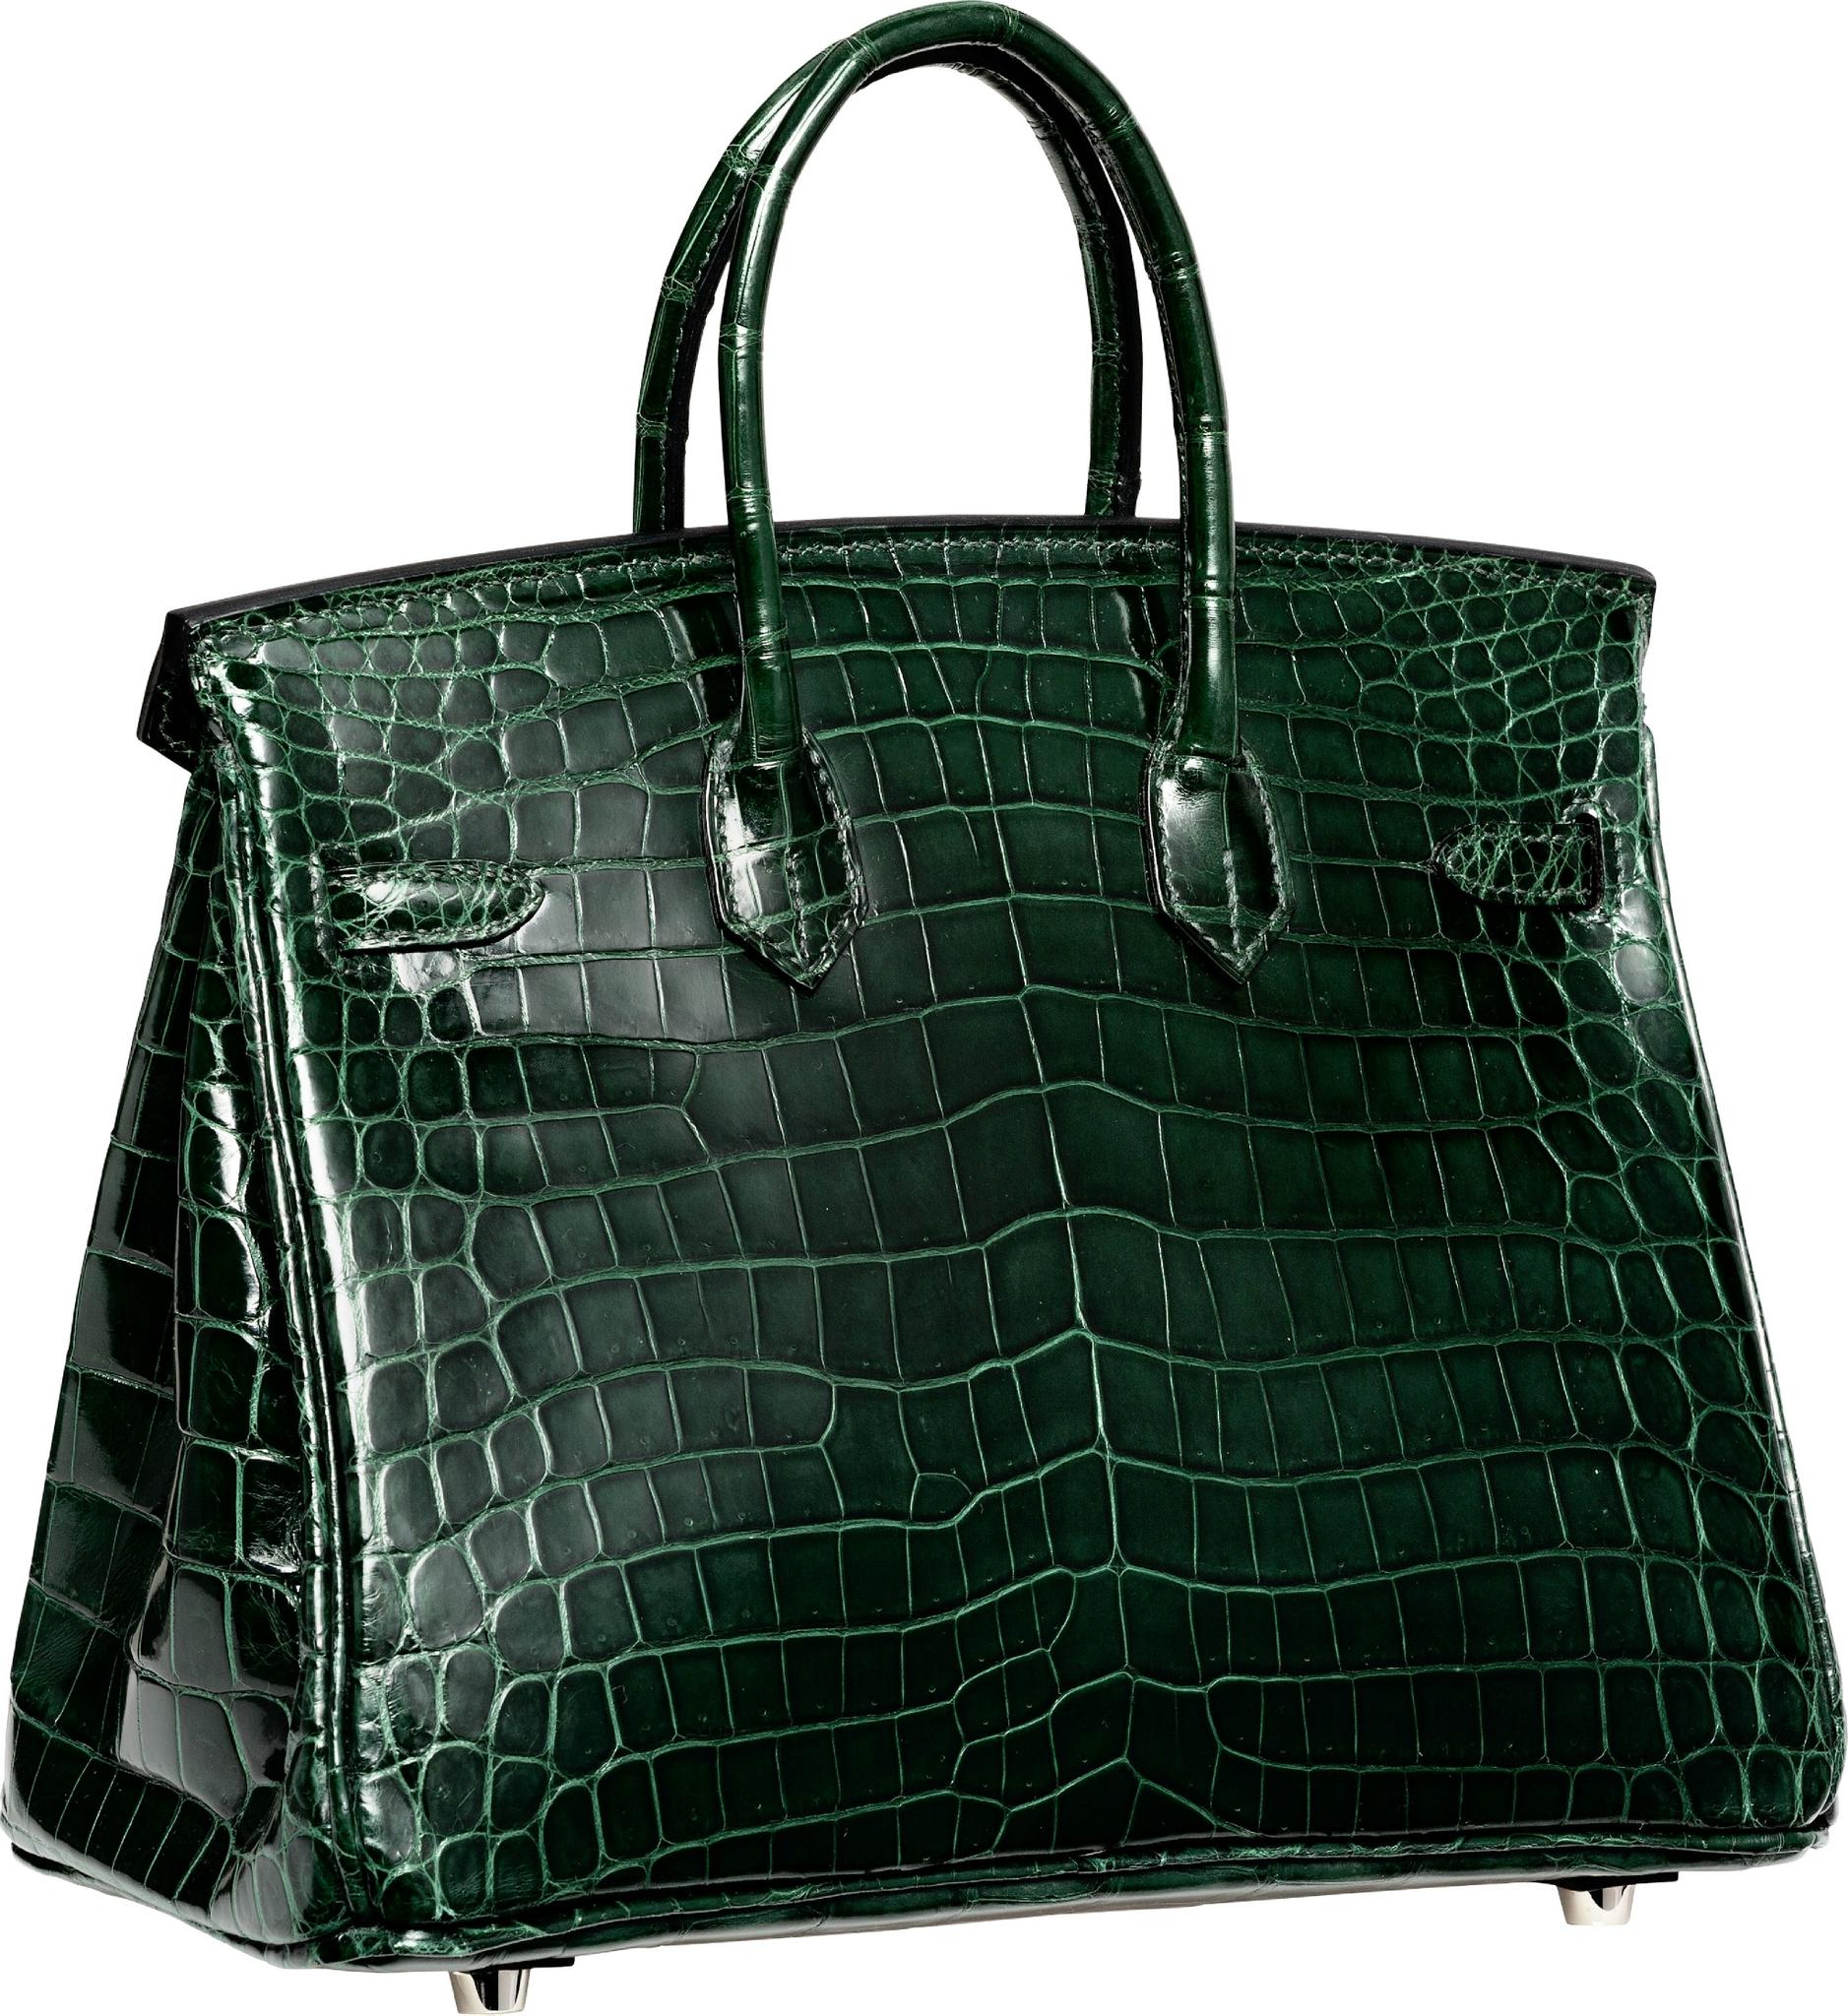 b973ad3a1e08 Hermès 25cm Shiny Vert Fonce Nilo Crocodile Birkin Bag with Palladium  Hardware. N Square